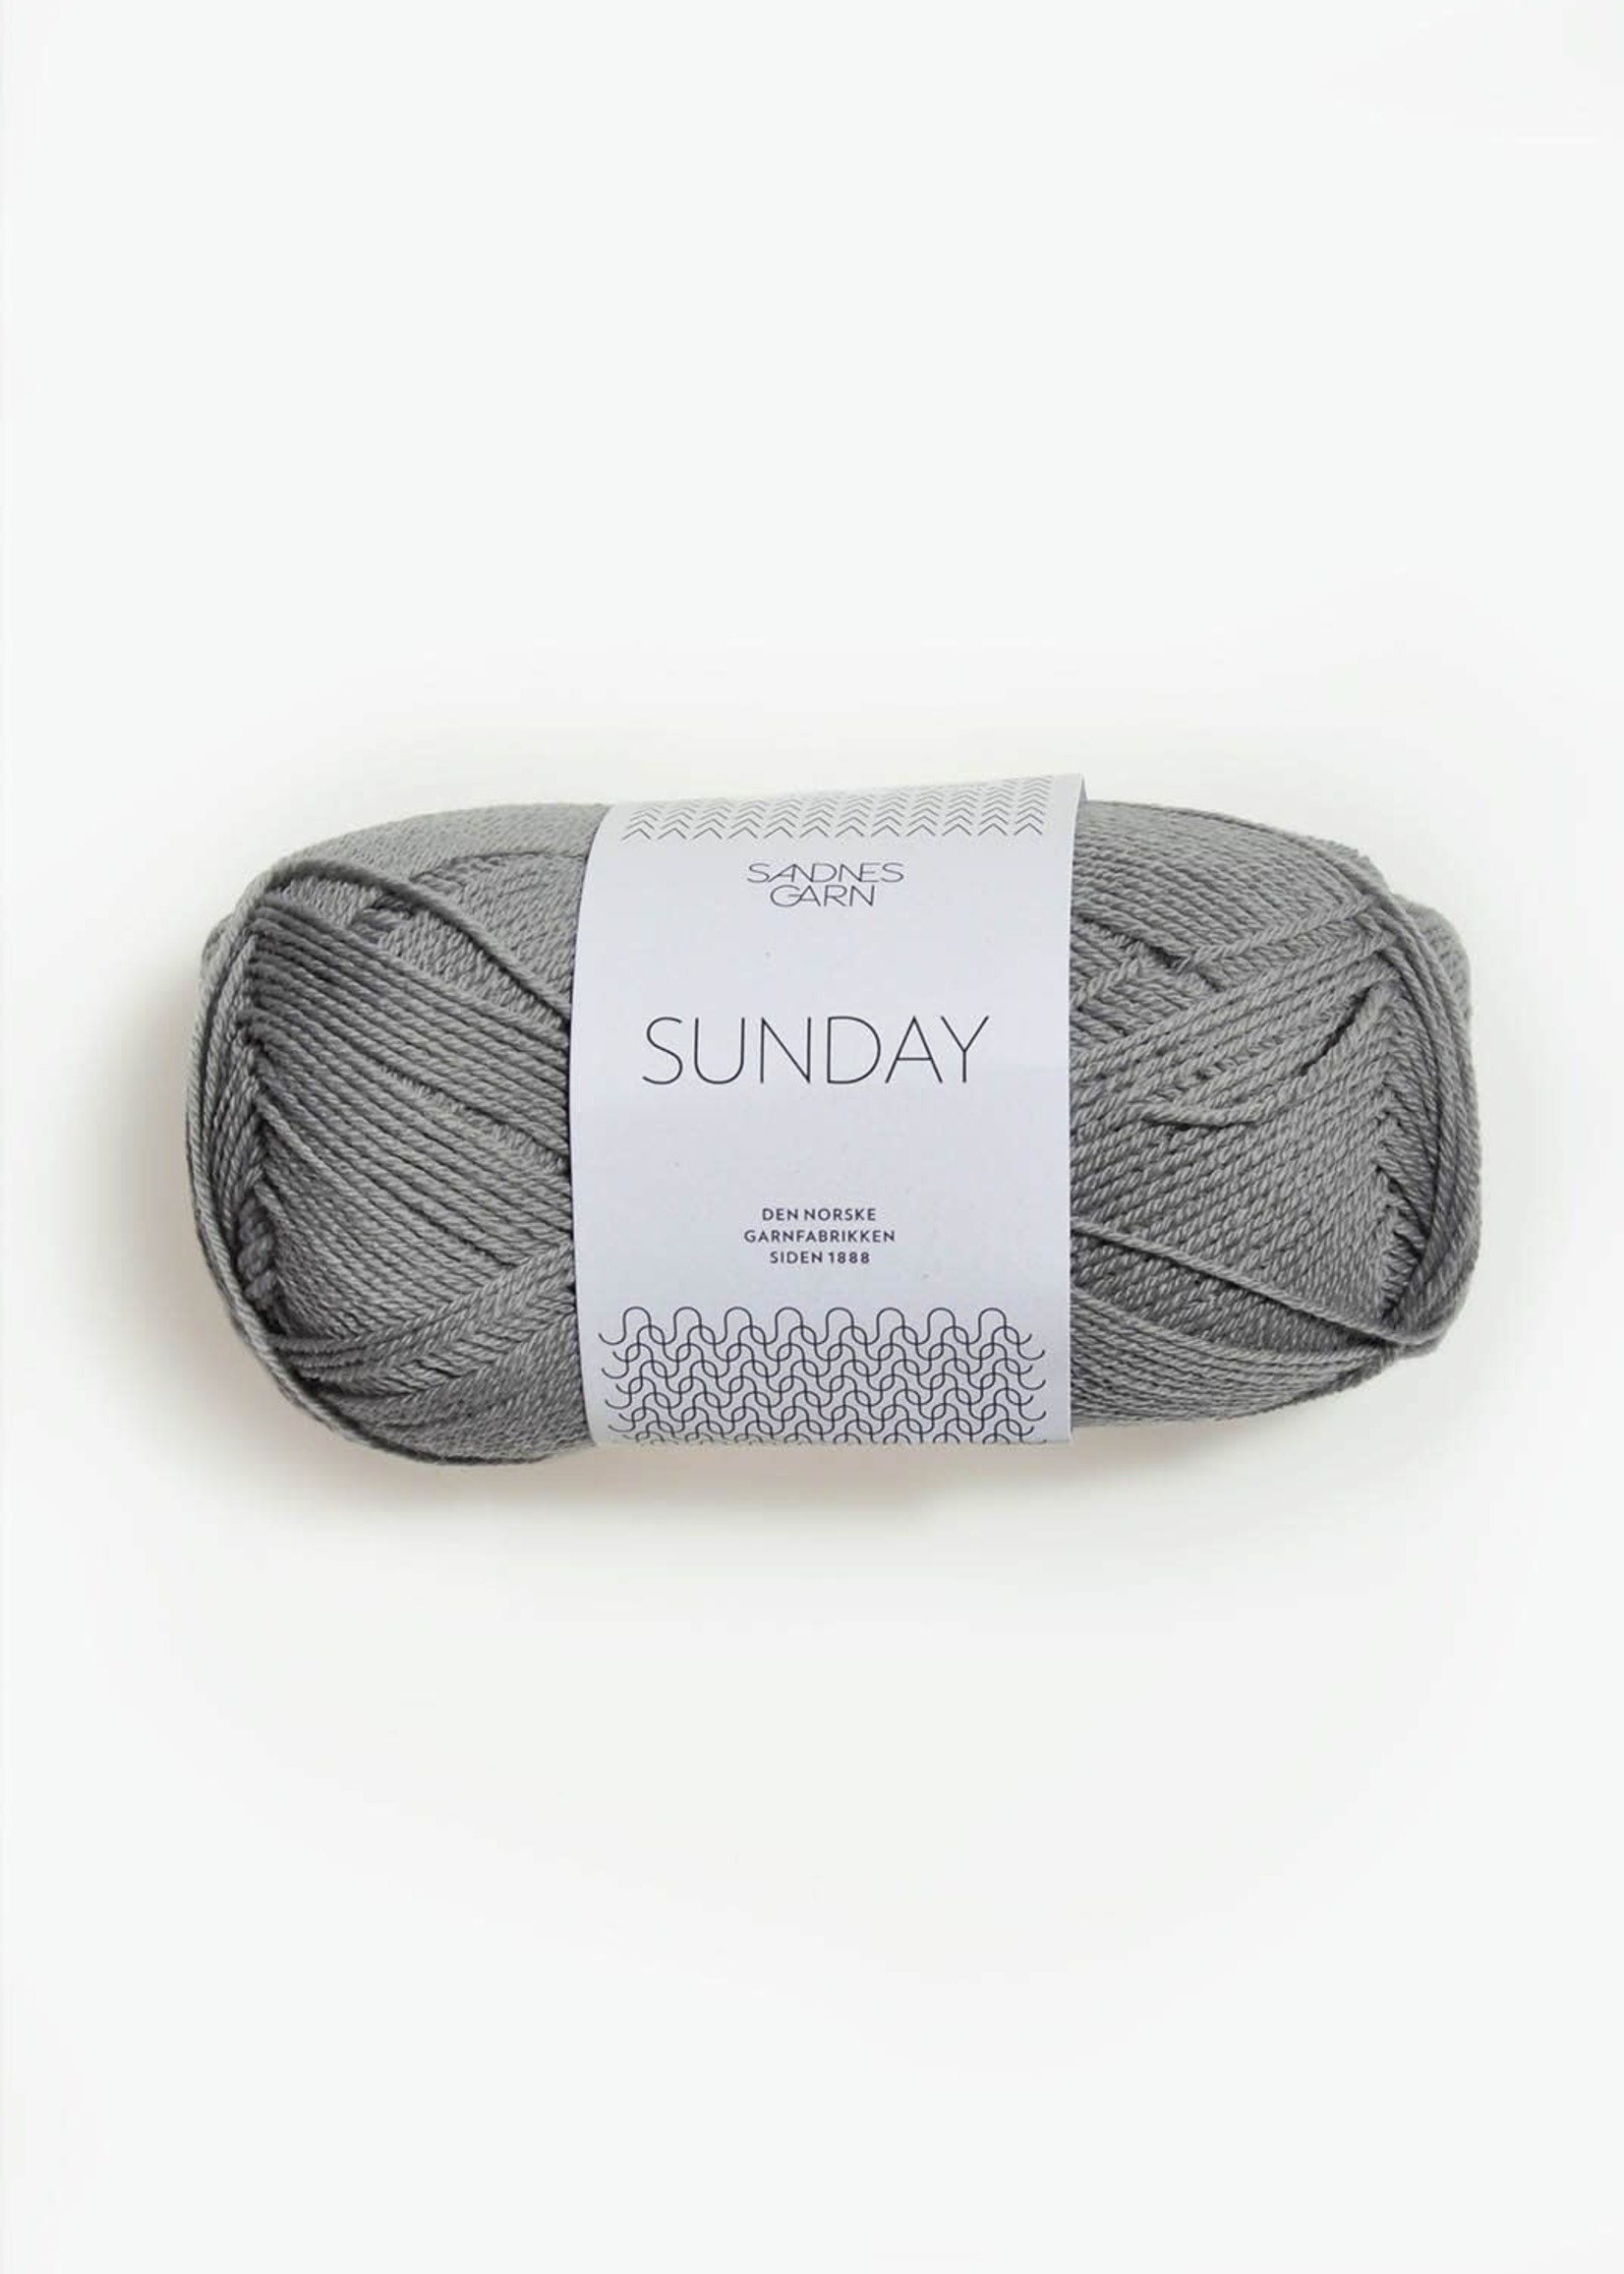 Sandnes Garn Sunday - #1045 Lys Gra